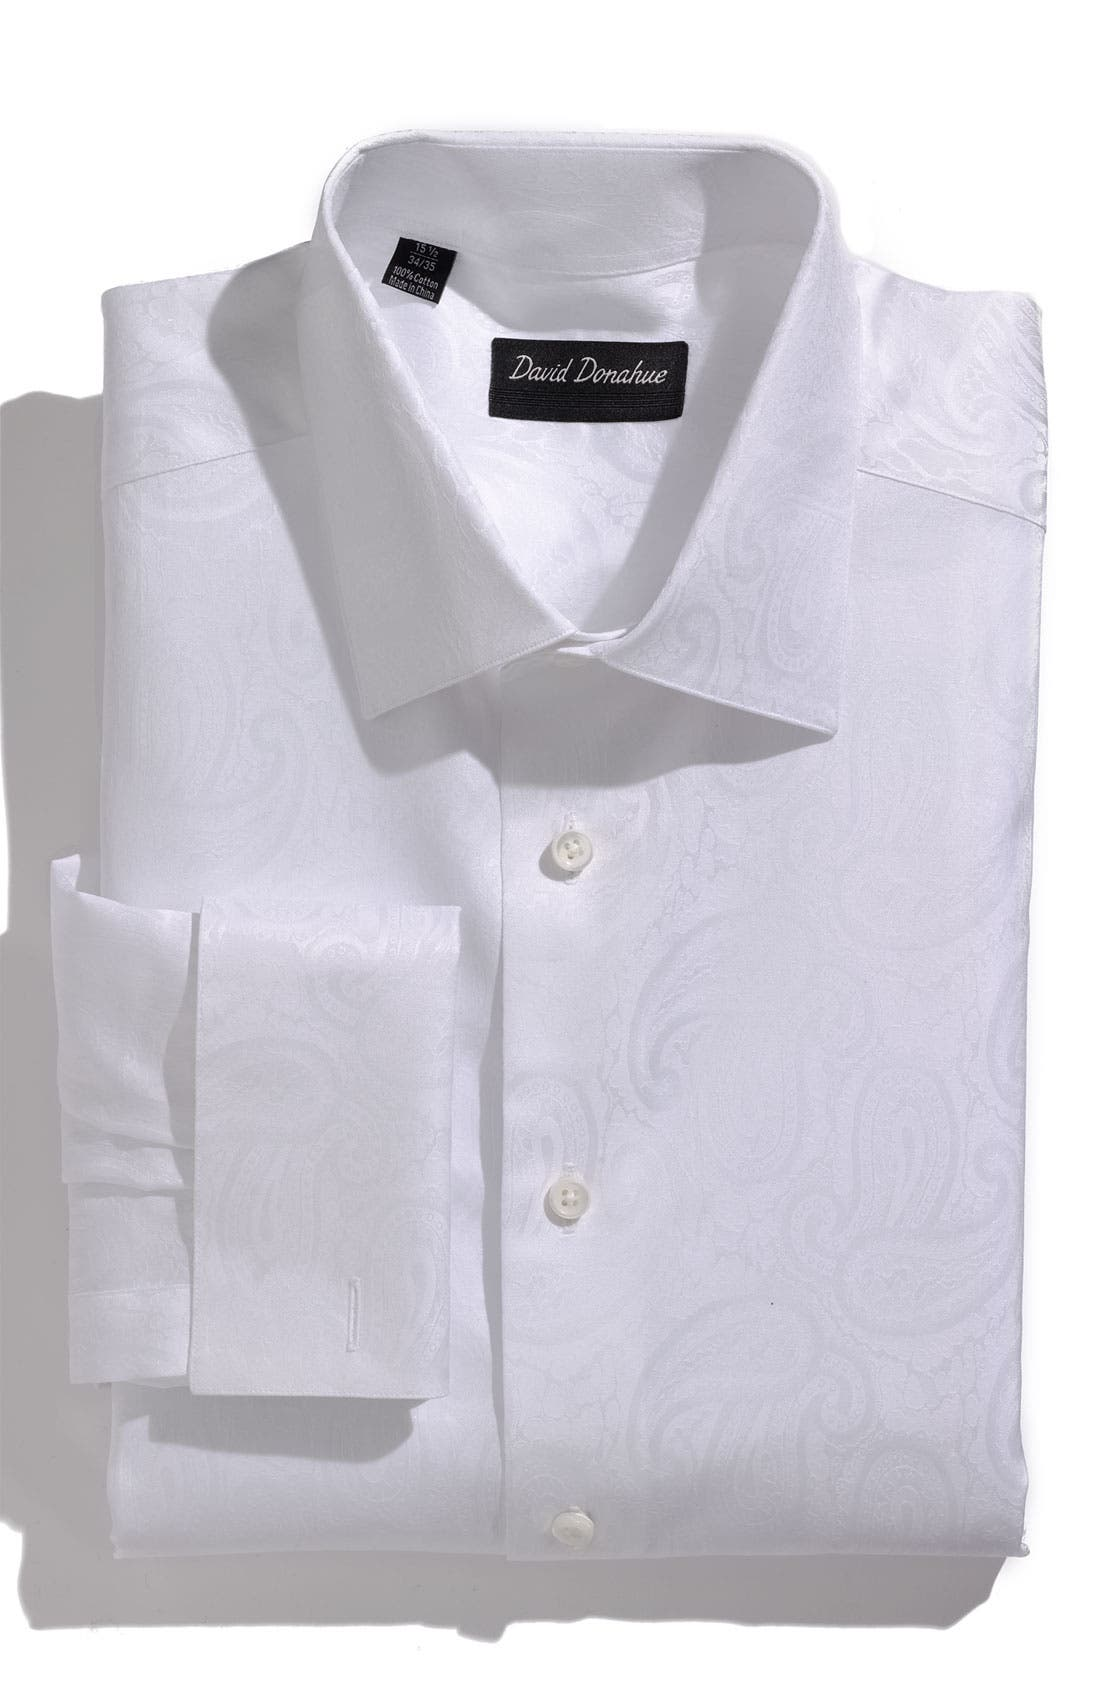 Alternate Image 1 Selected - David Donahue Regular Fit Tuxedo Shirt